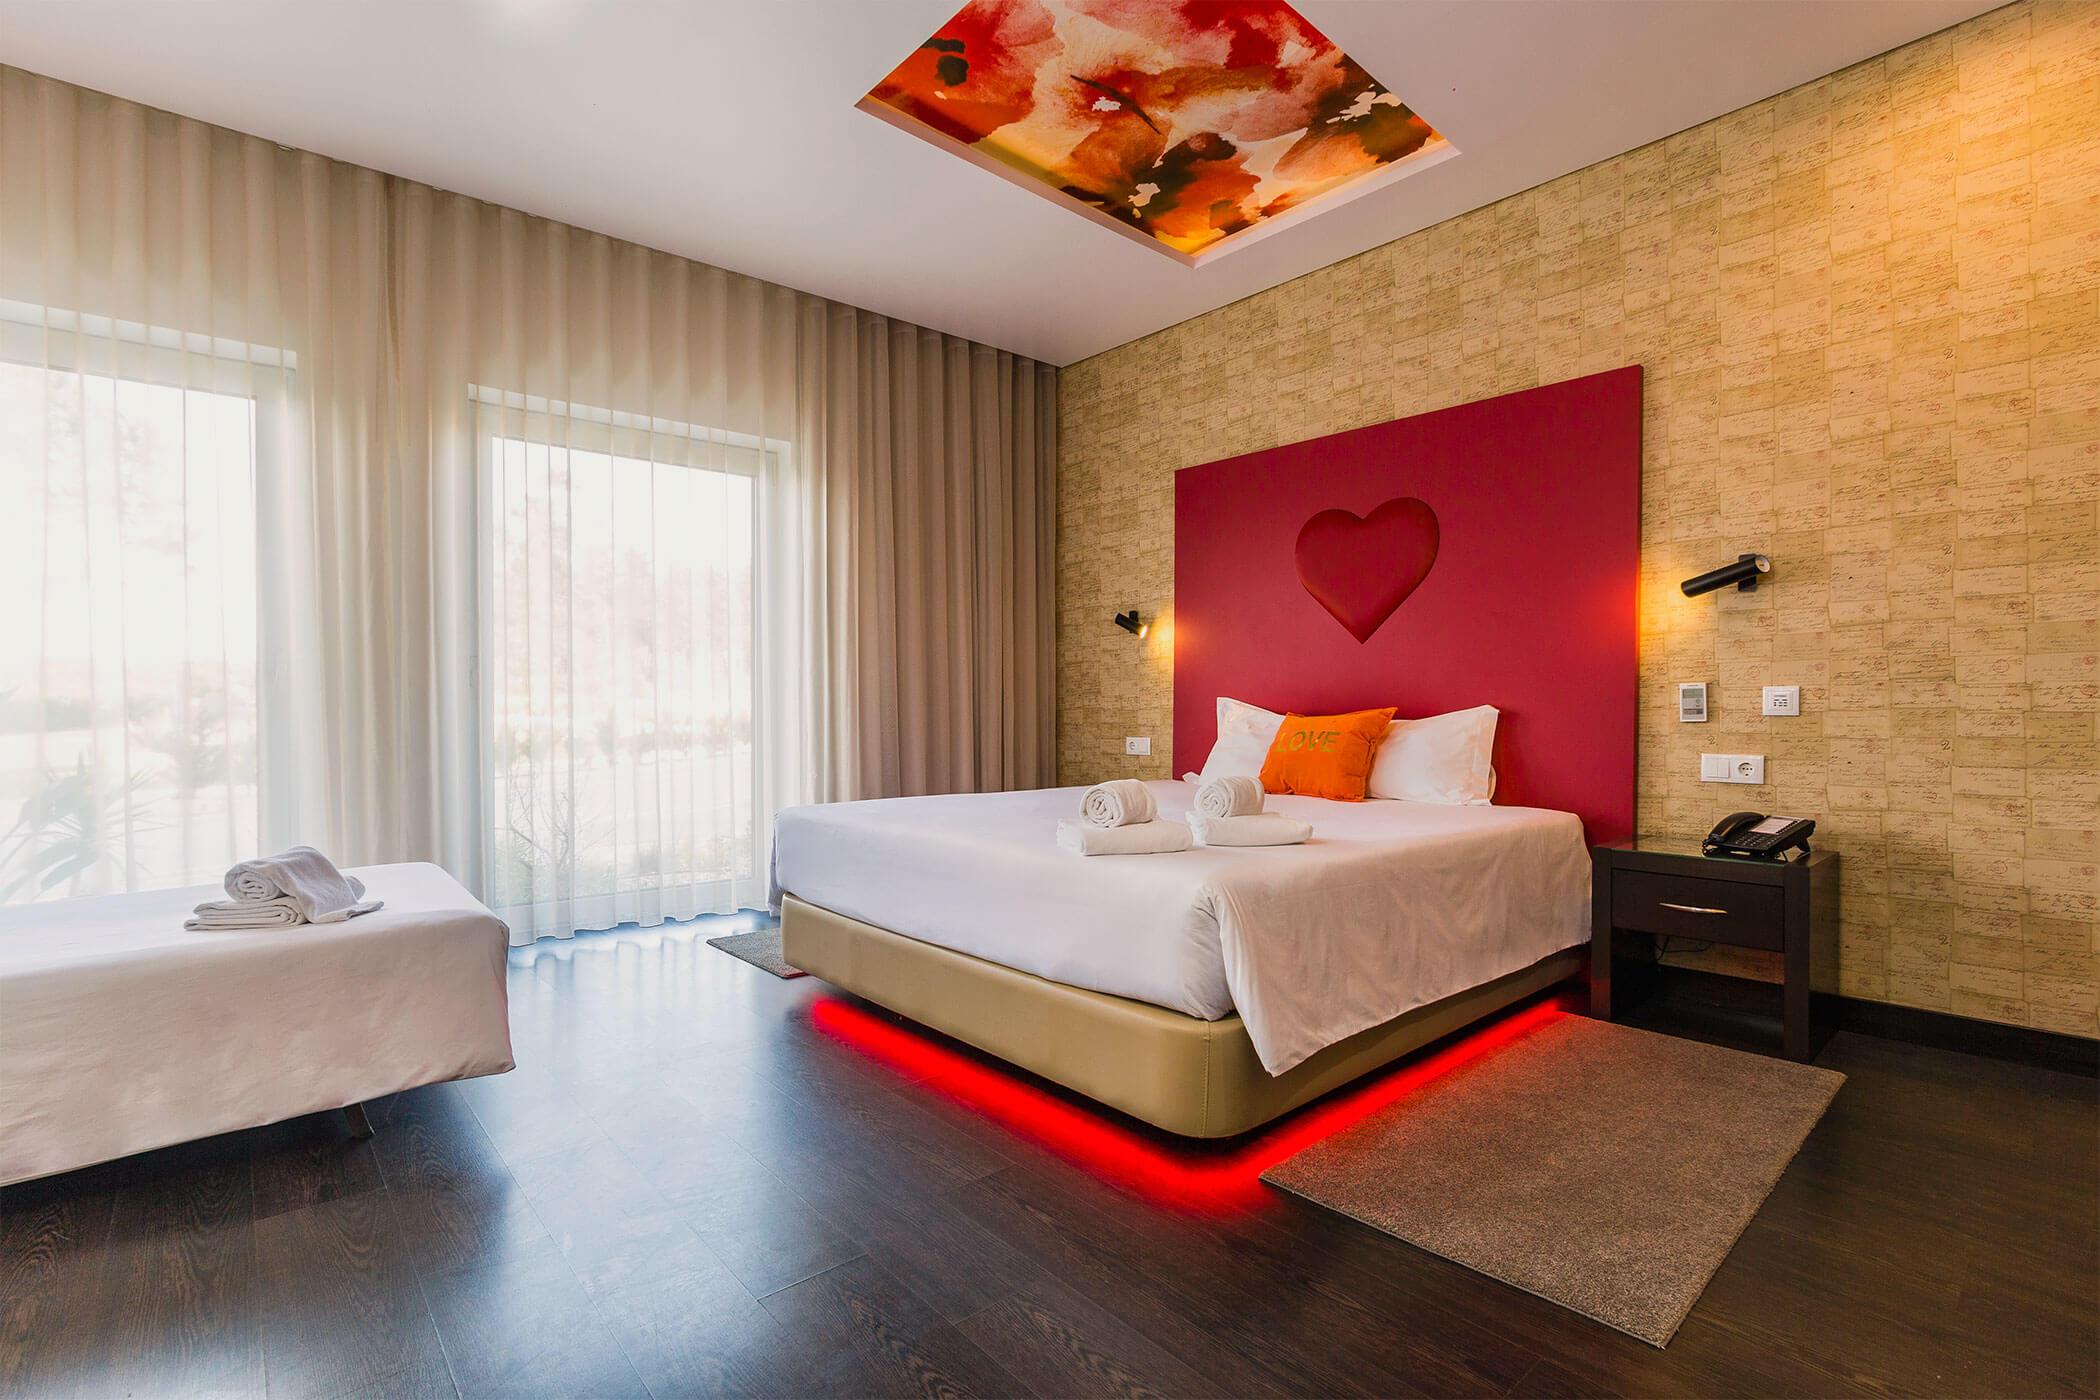 Habitacion de movilidad condicionada Amor e Cegovim - Lisotel Hotel & Spa, Leiria